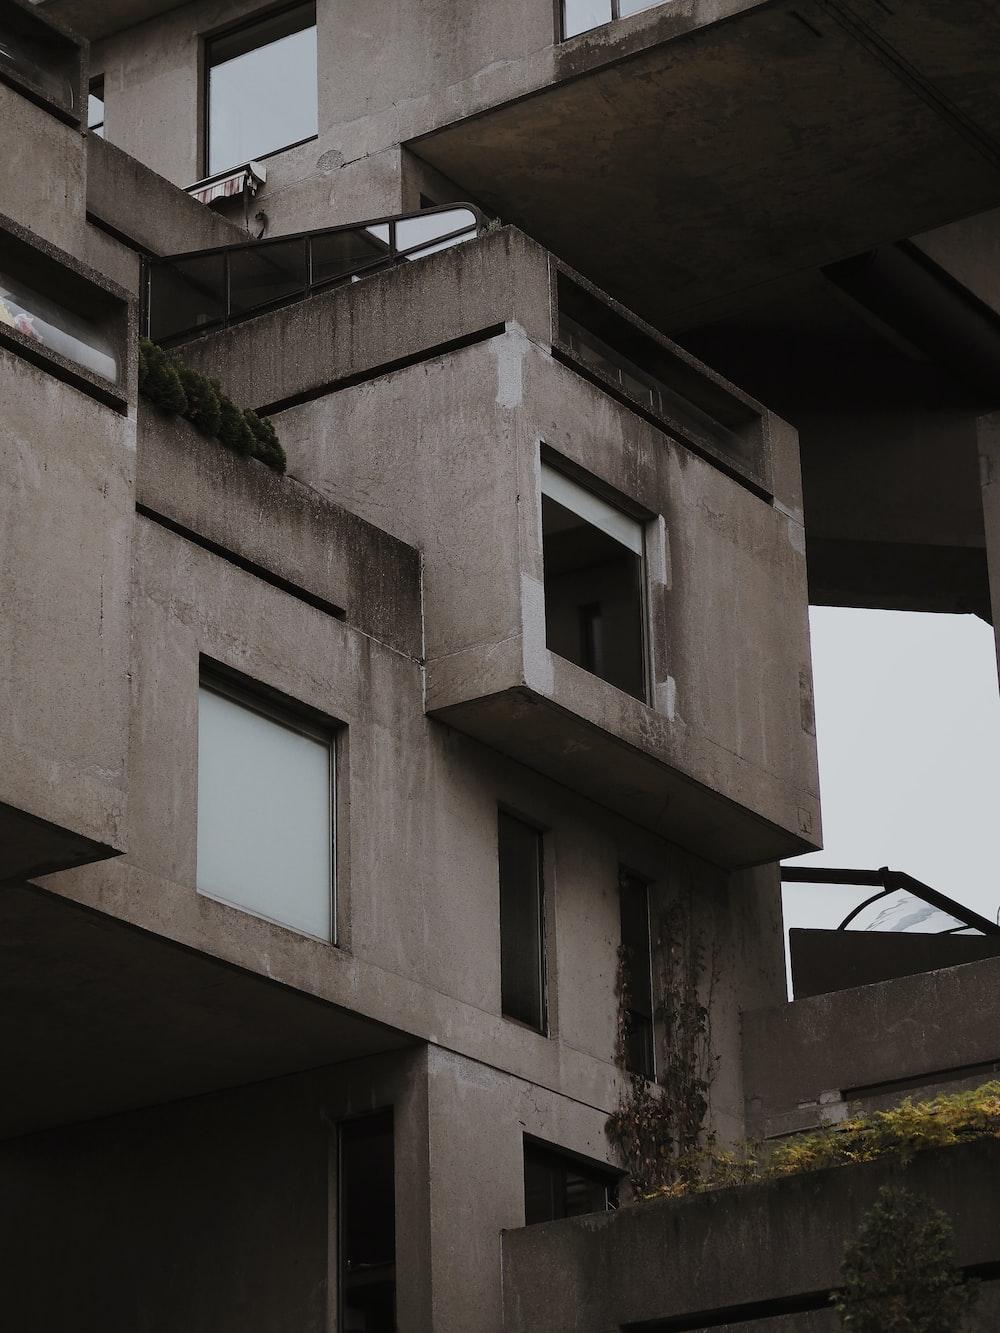 gray concrete multi story building